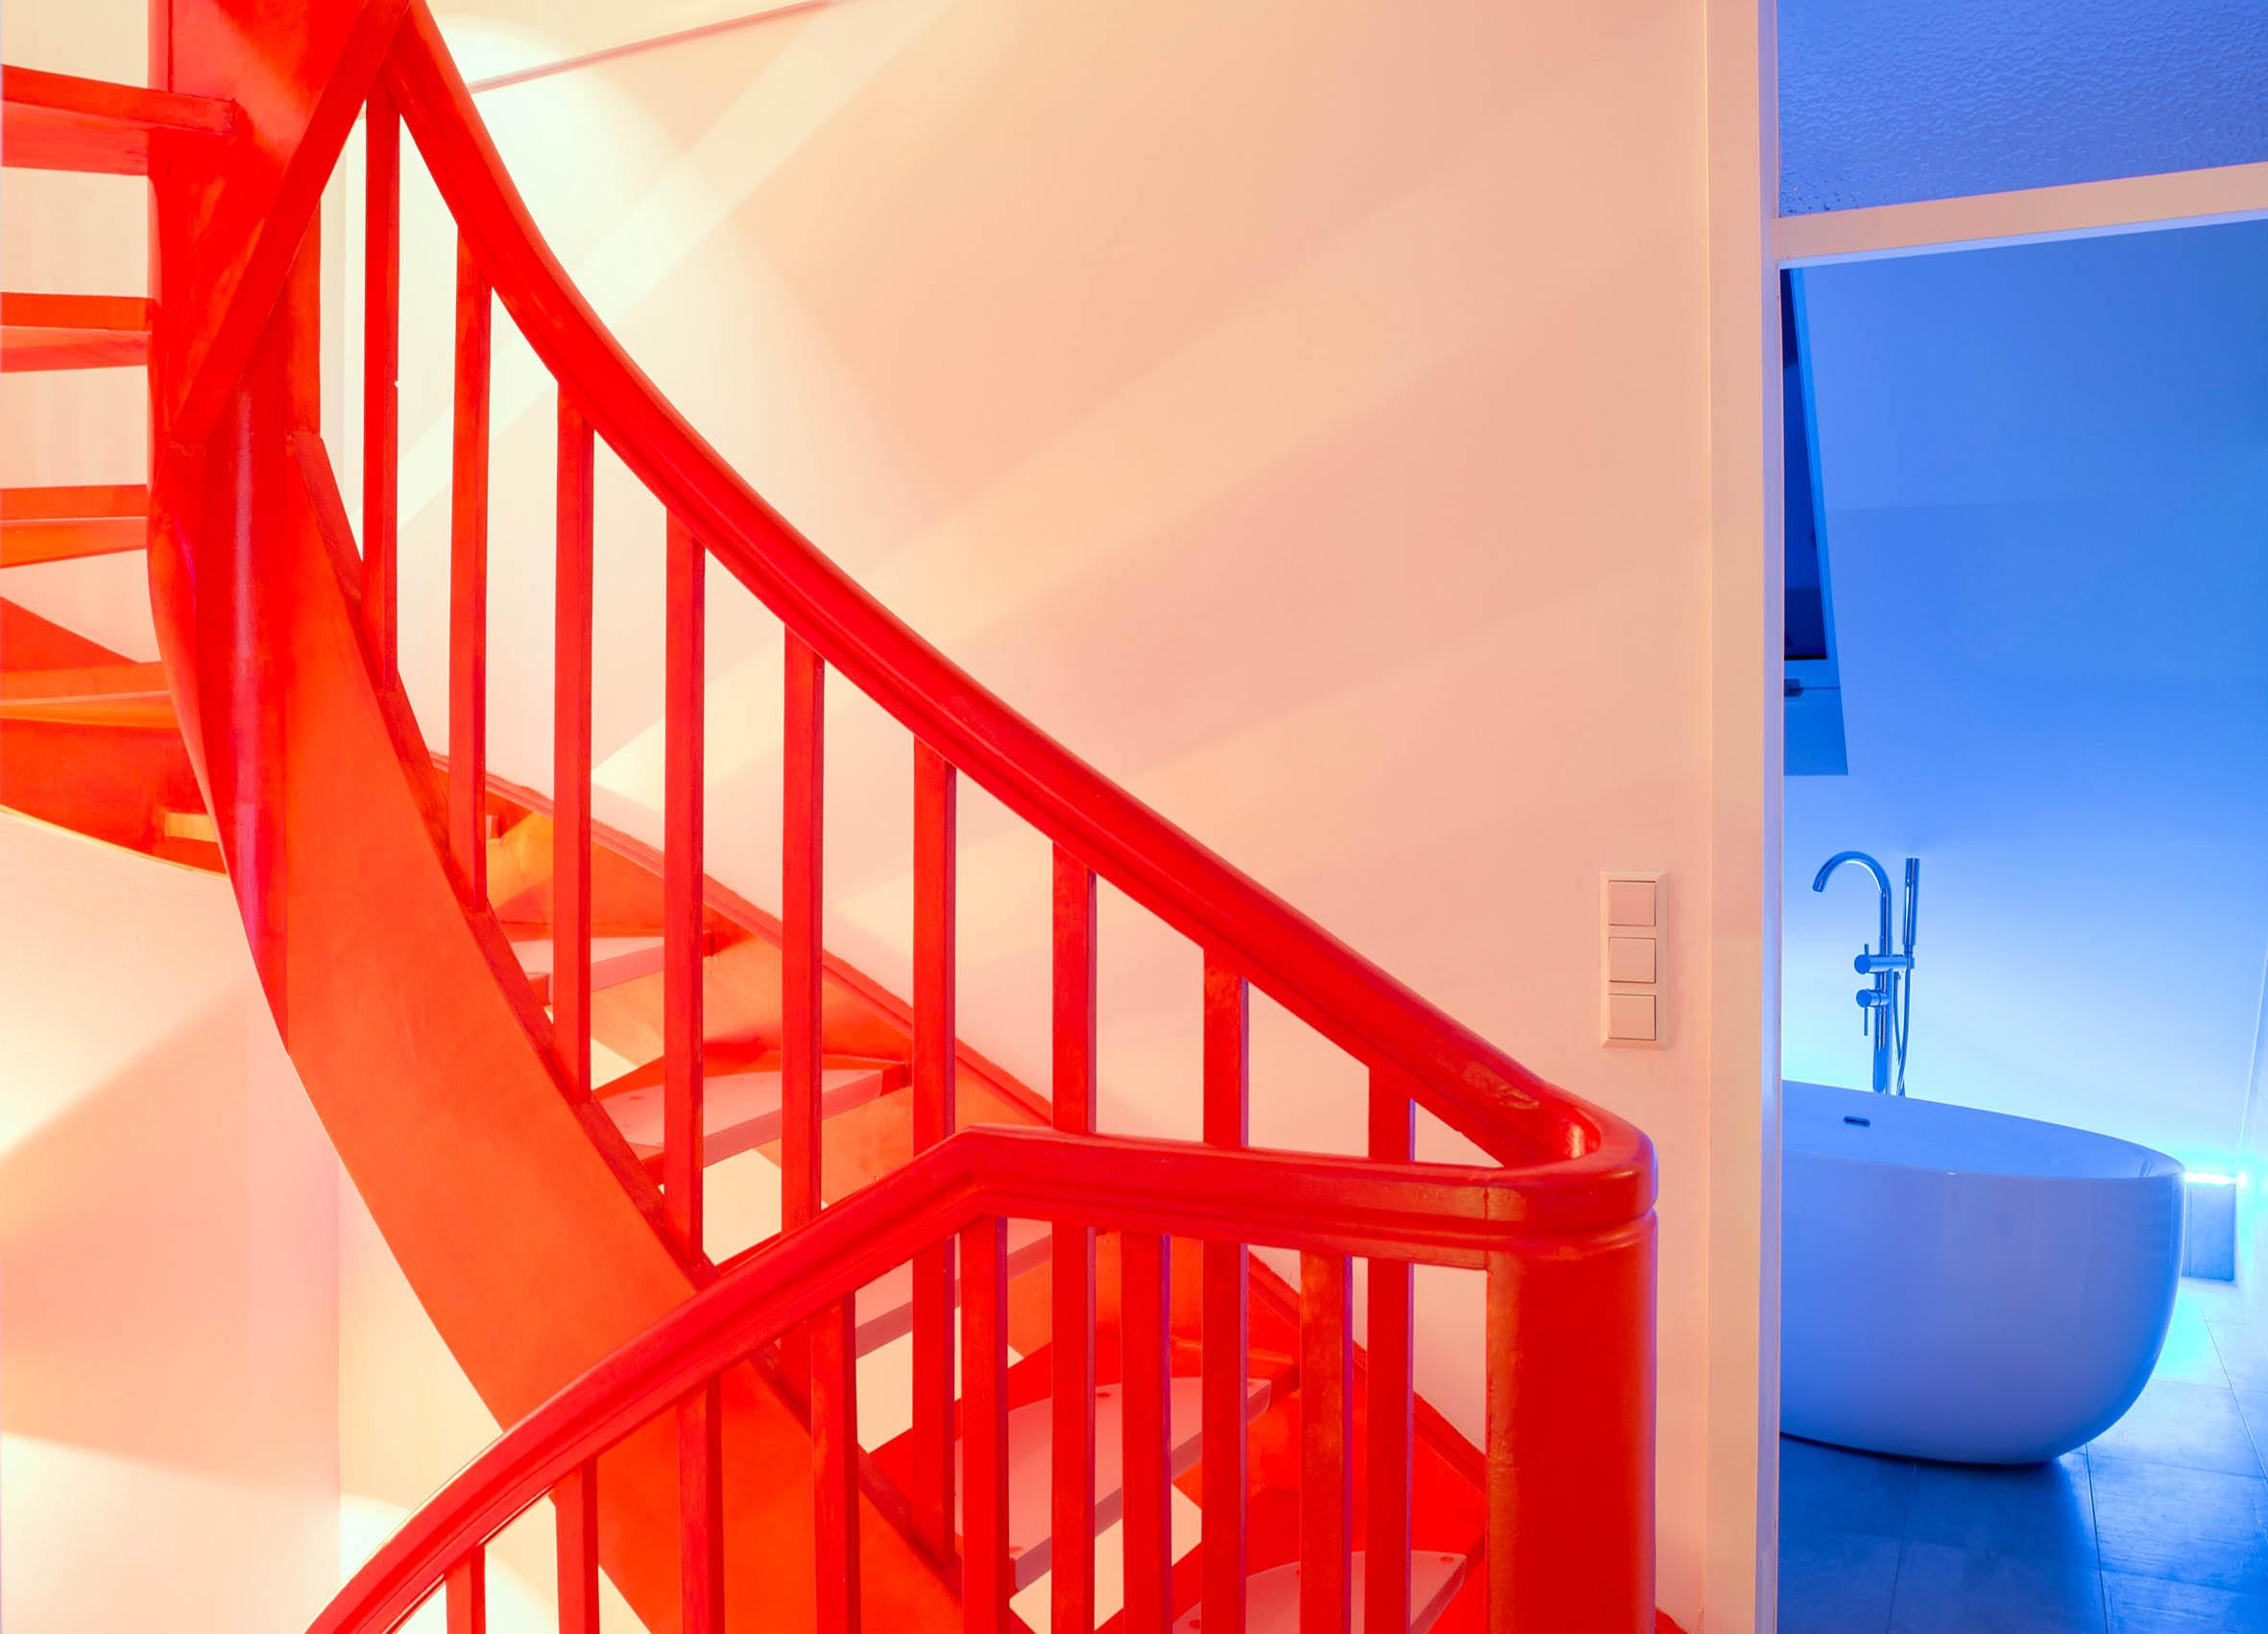 Wohnen - Private residence refurbishment, Berlin, Germany